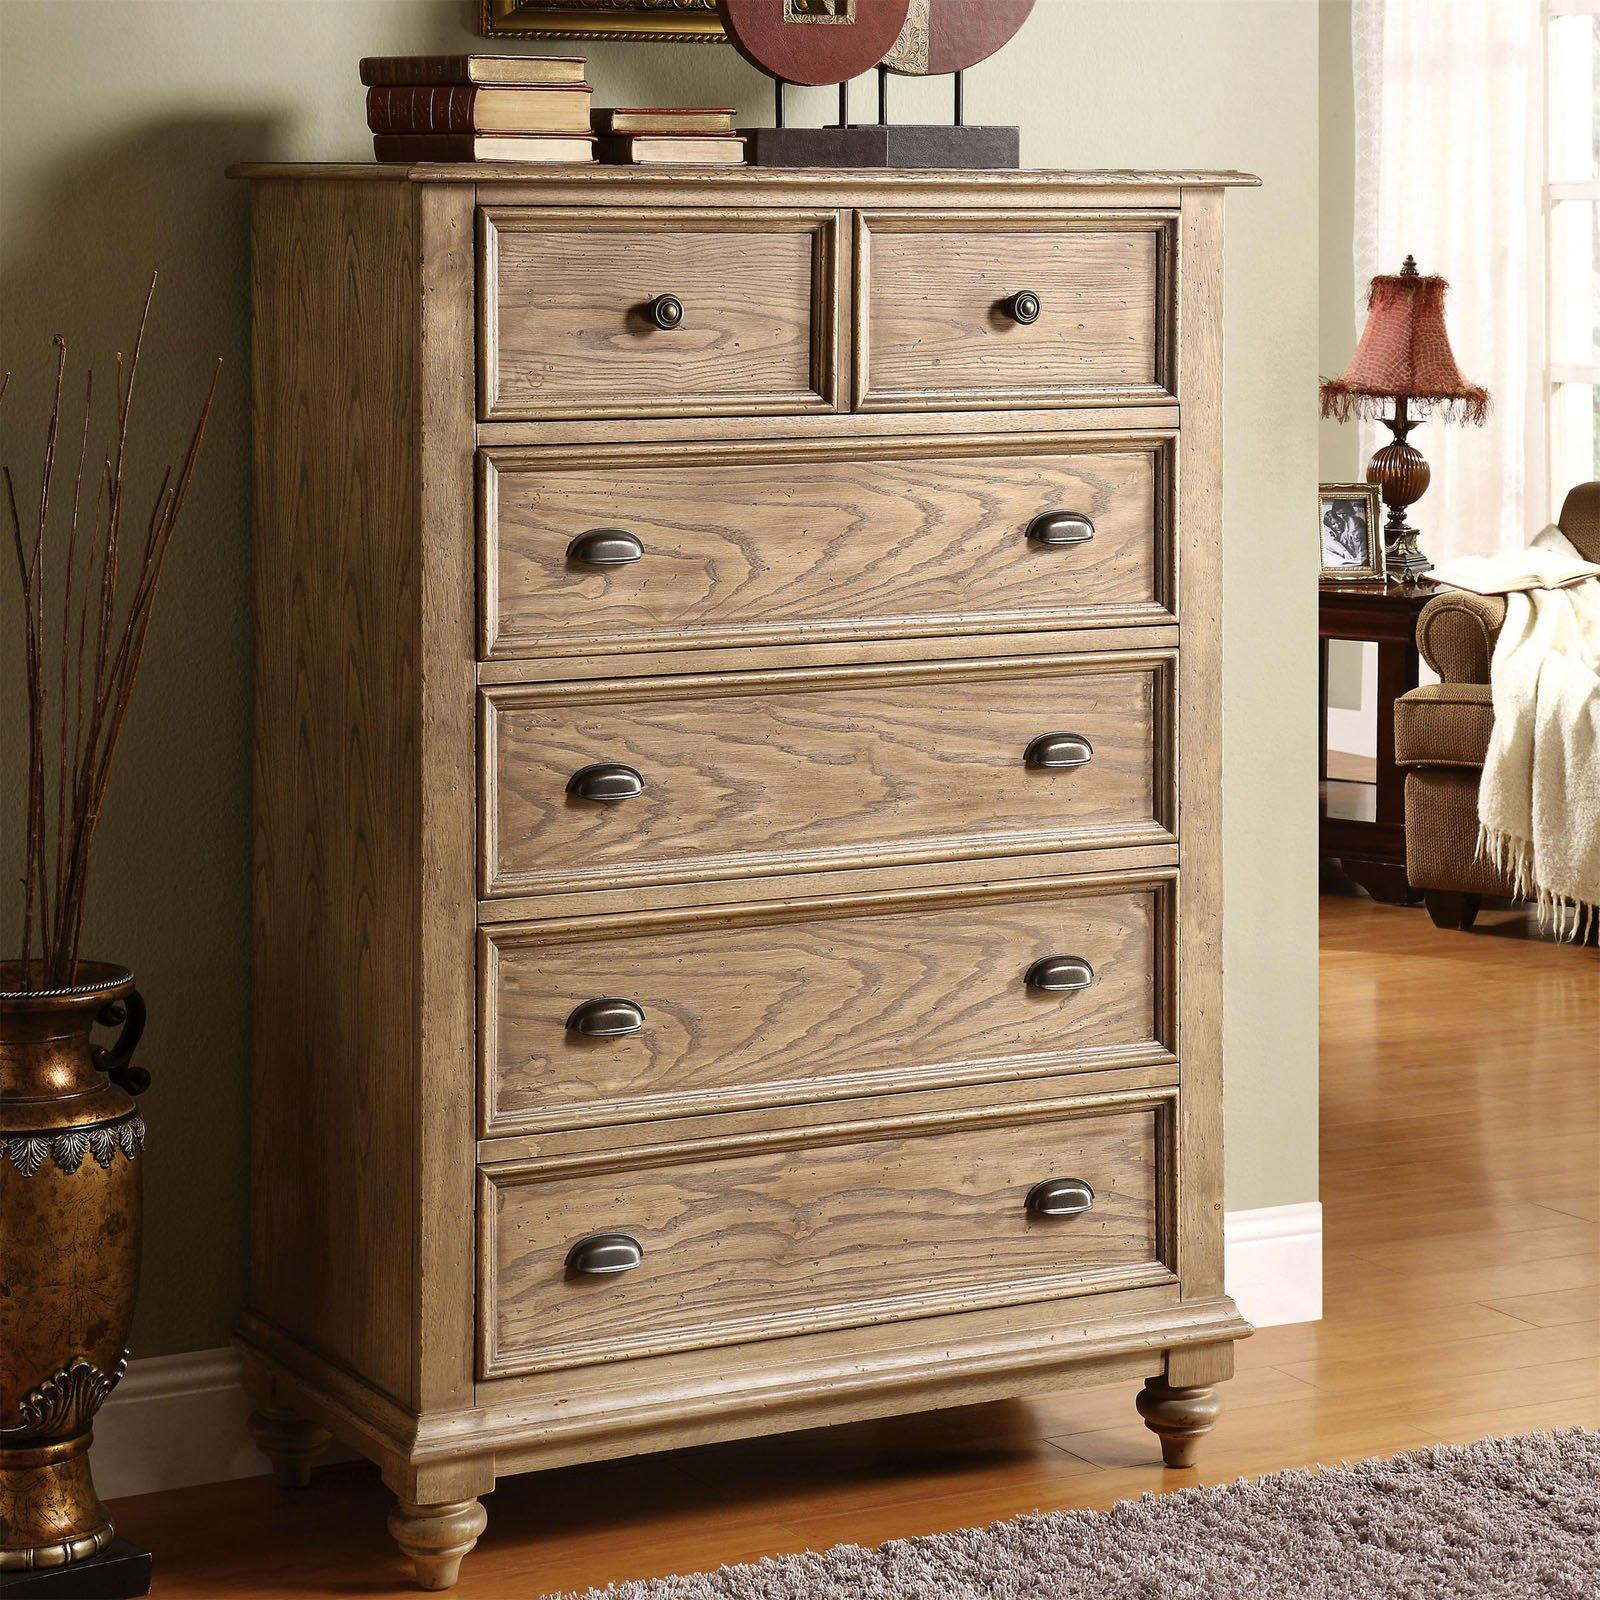 riverside coventry 5 drawer dresser - weathered driftwood | hayneedle EHDZBTE